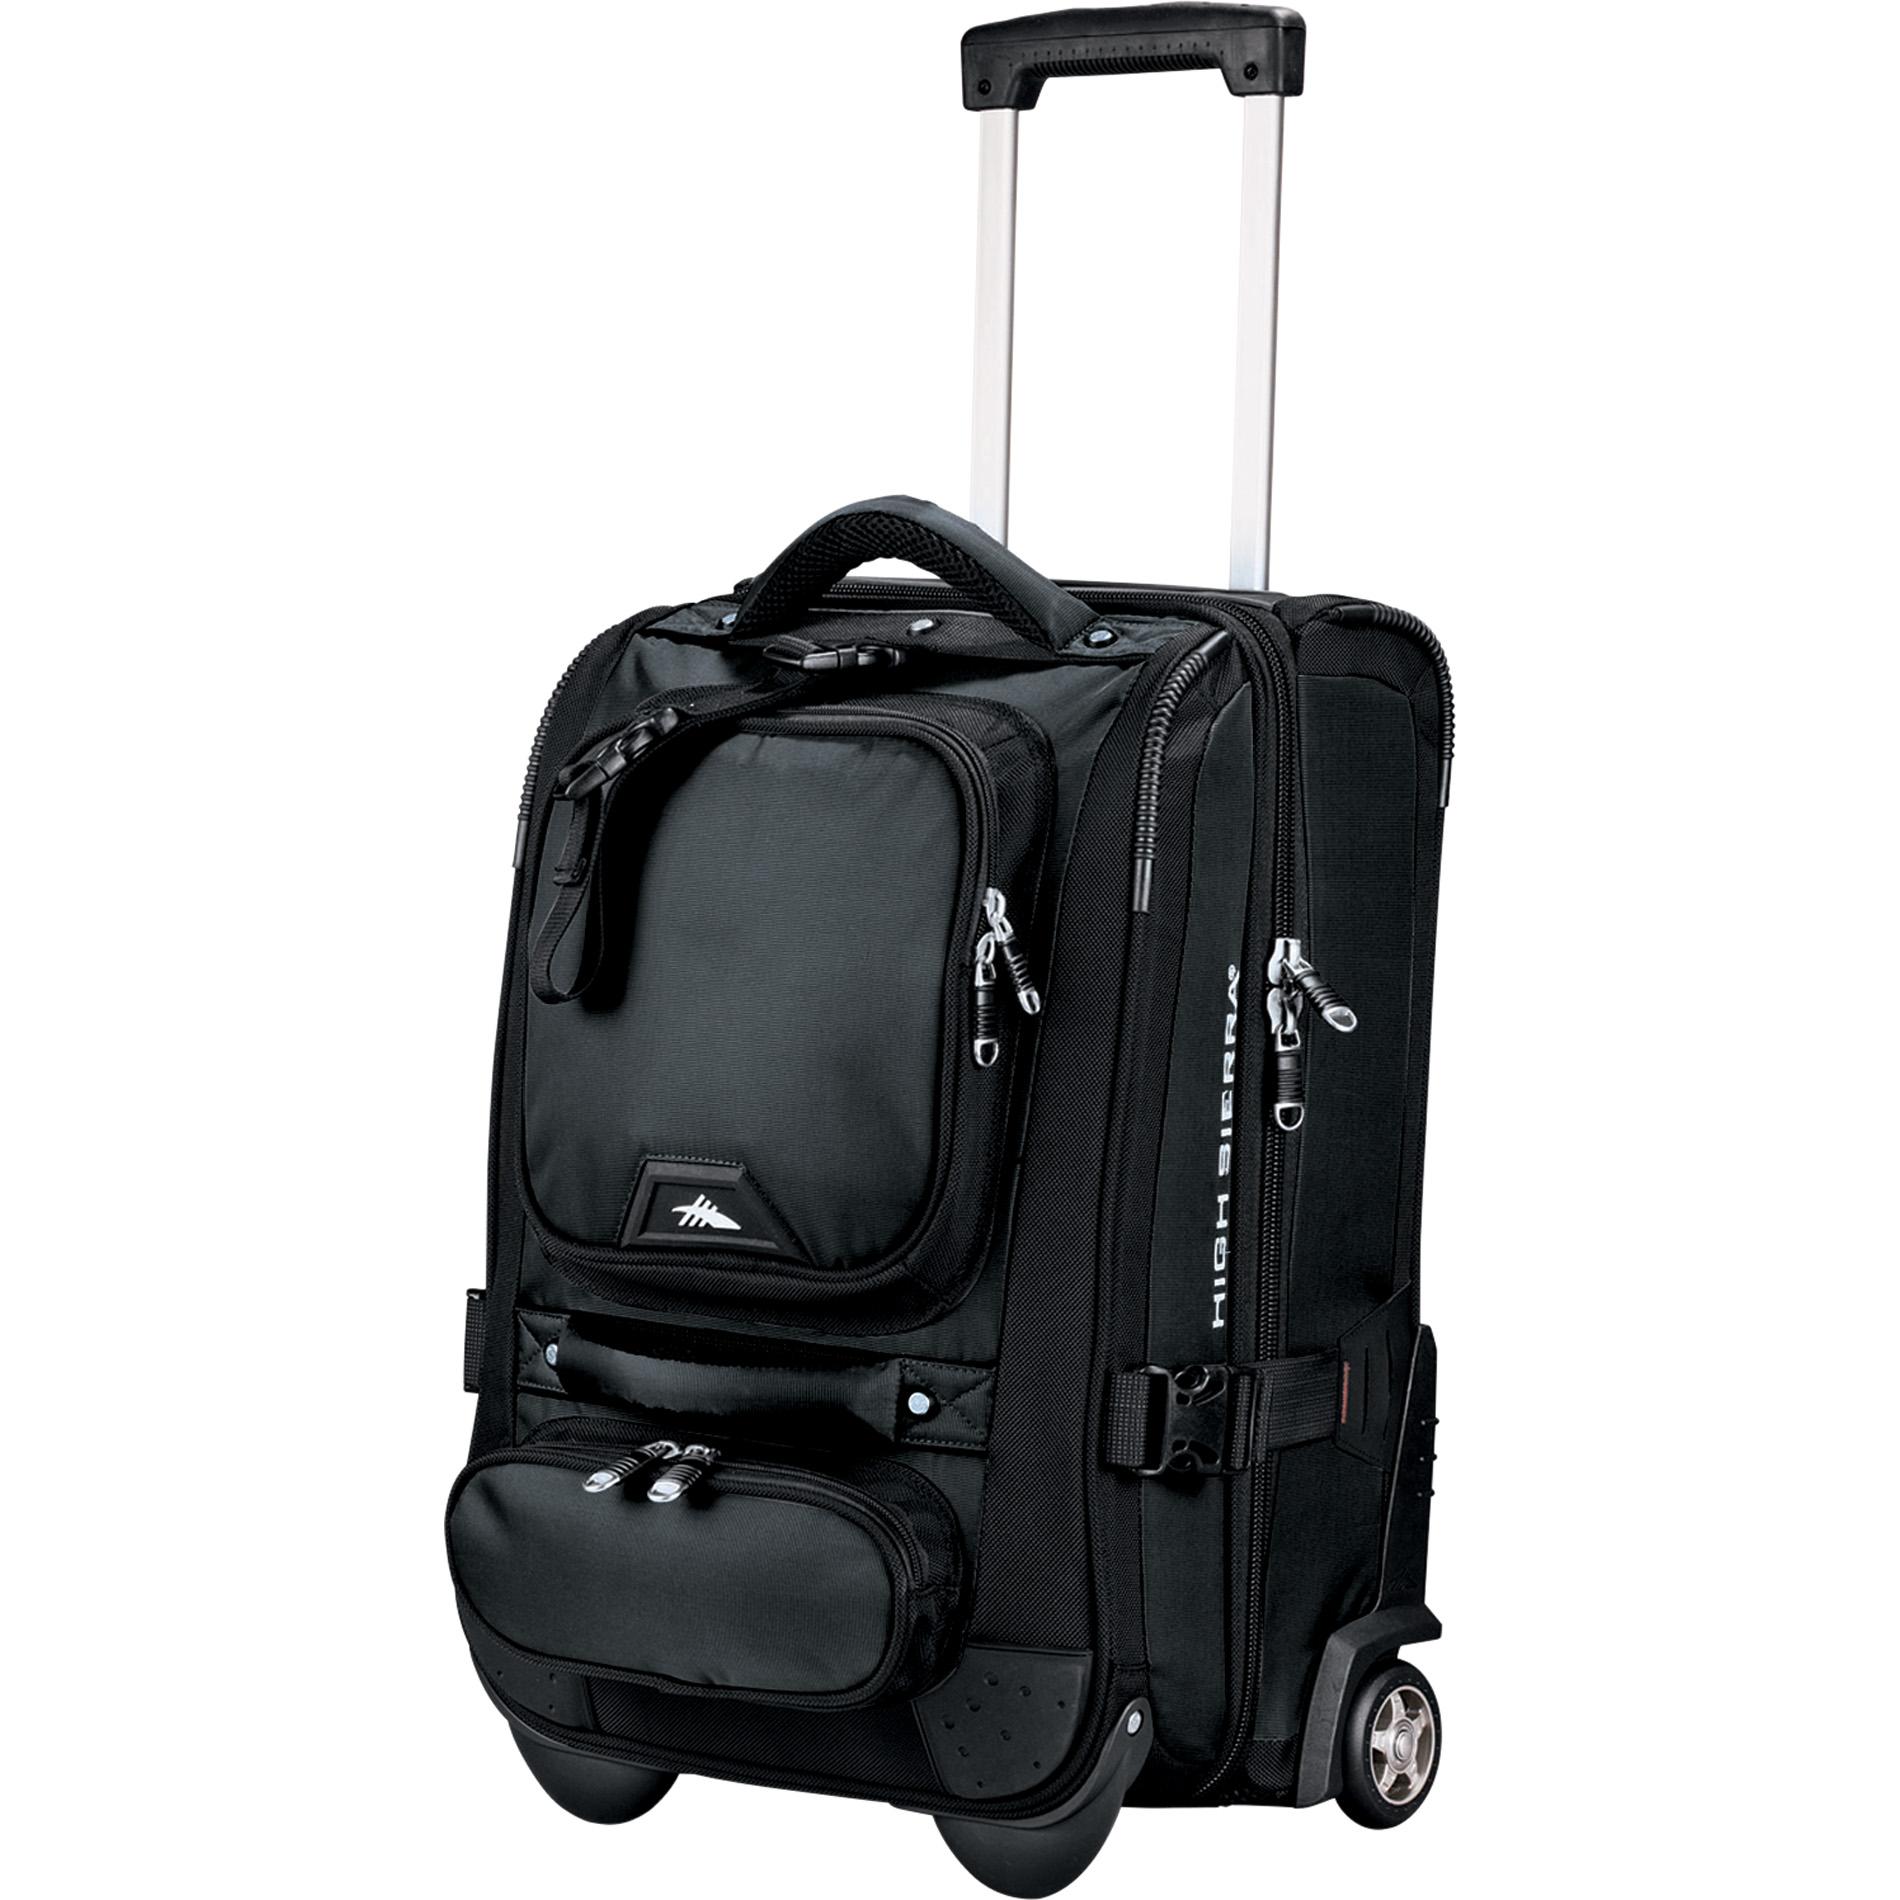 High Sierra 8050-21 - 21 Carry-On Upright Duffel Bag